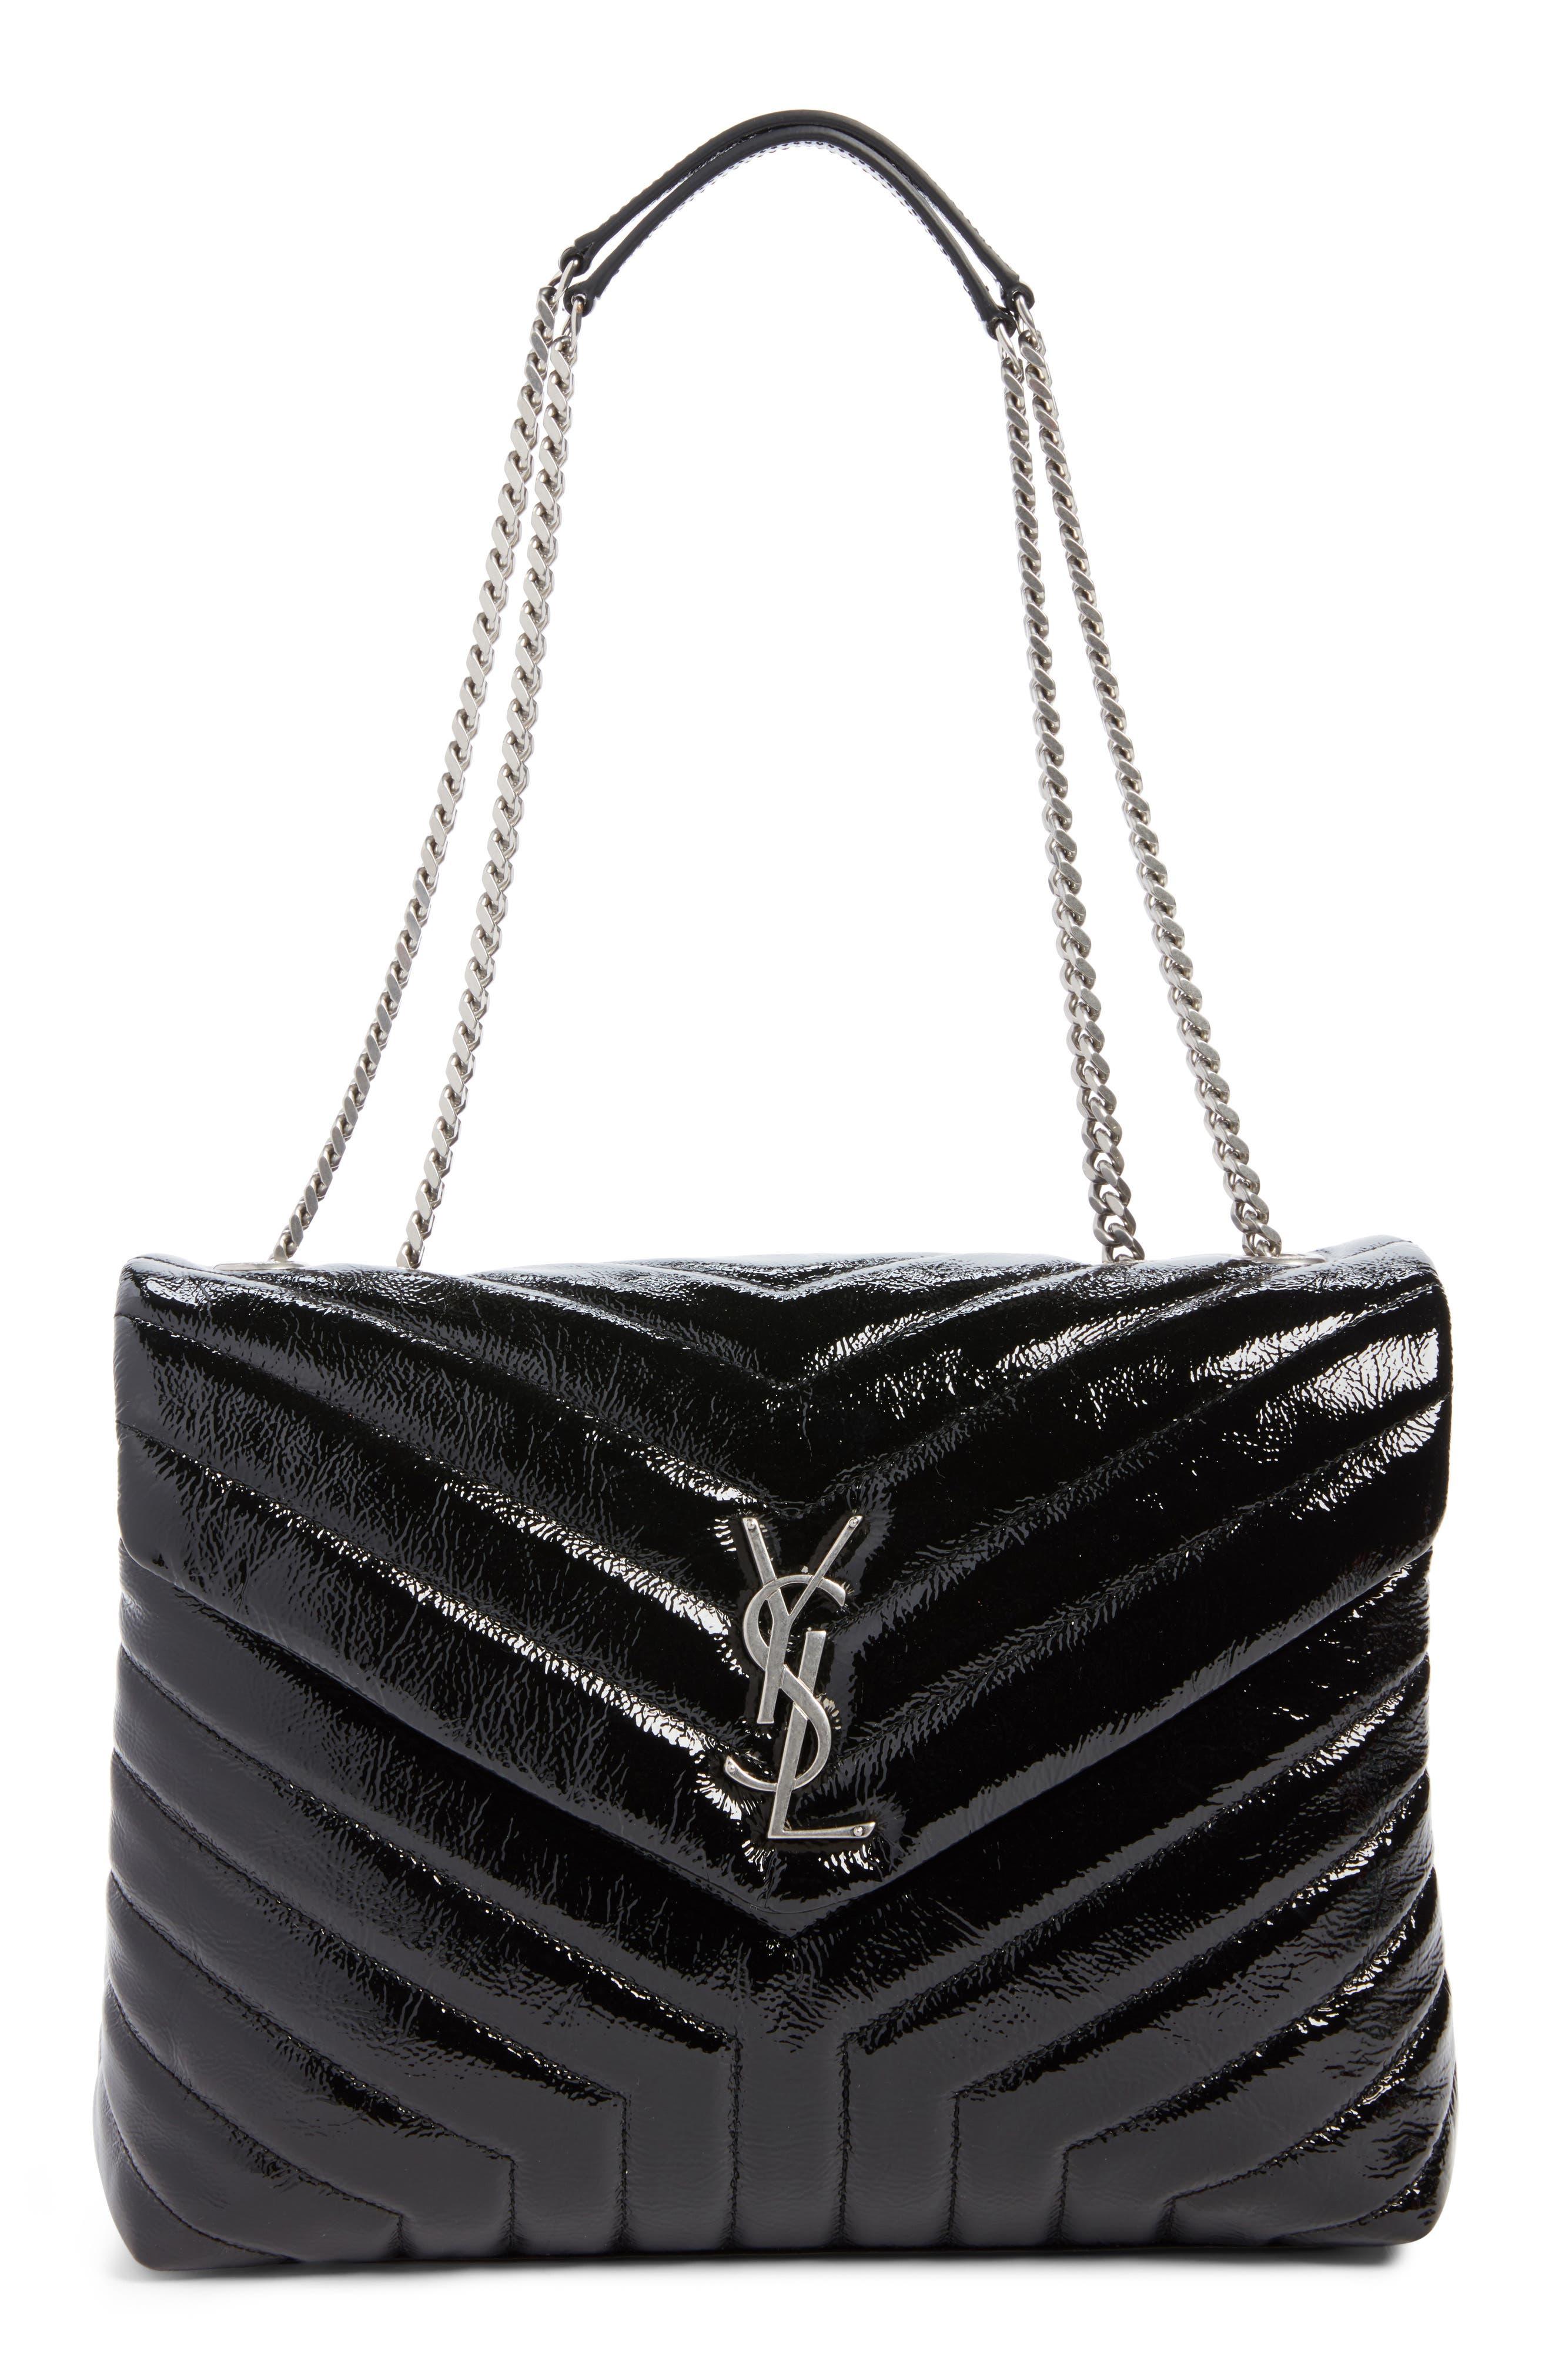 Alternate Image 1 Selected - Saint Laurent Medium LouLou Patent Leather Shoulder Bag